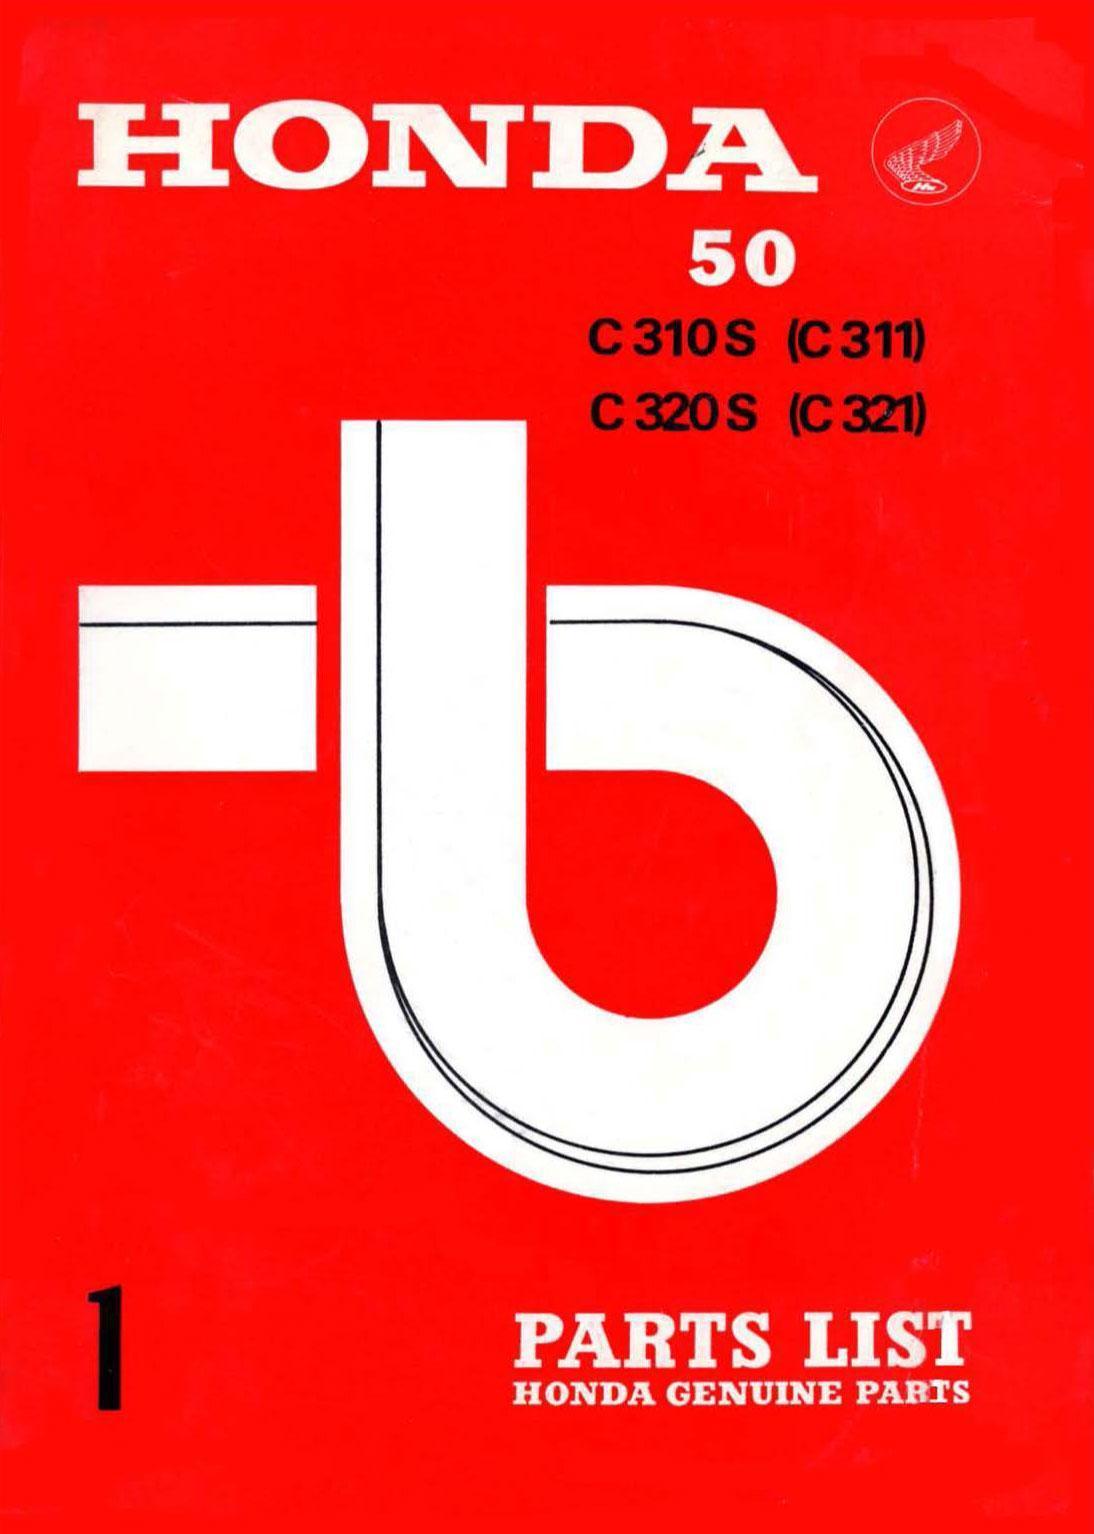 Parts List for Honda C310S (1967)